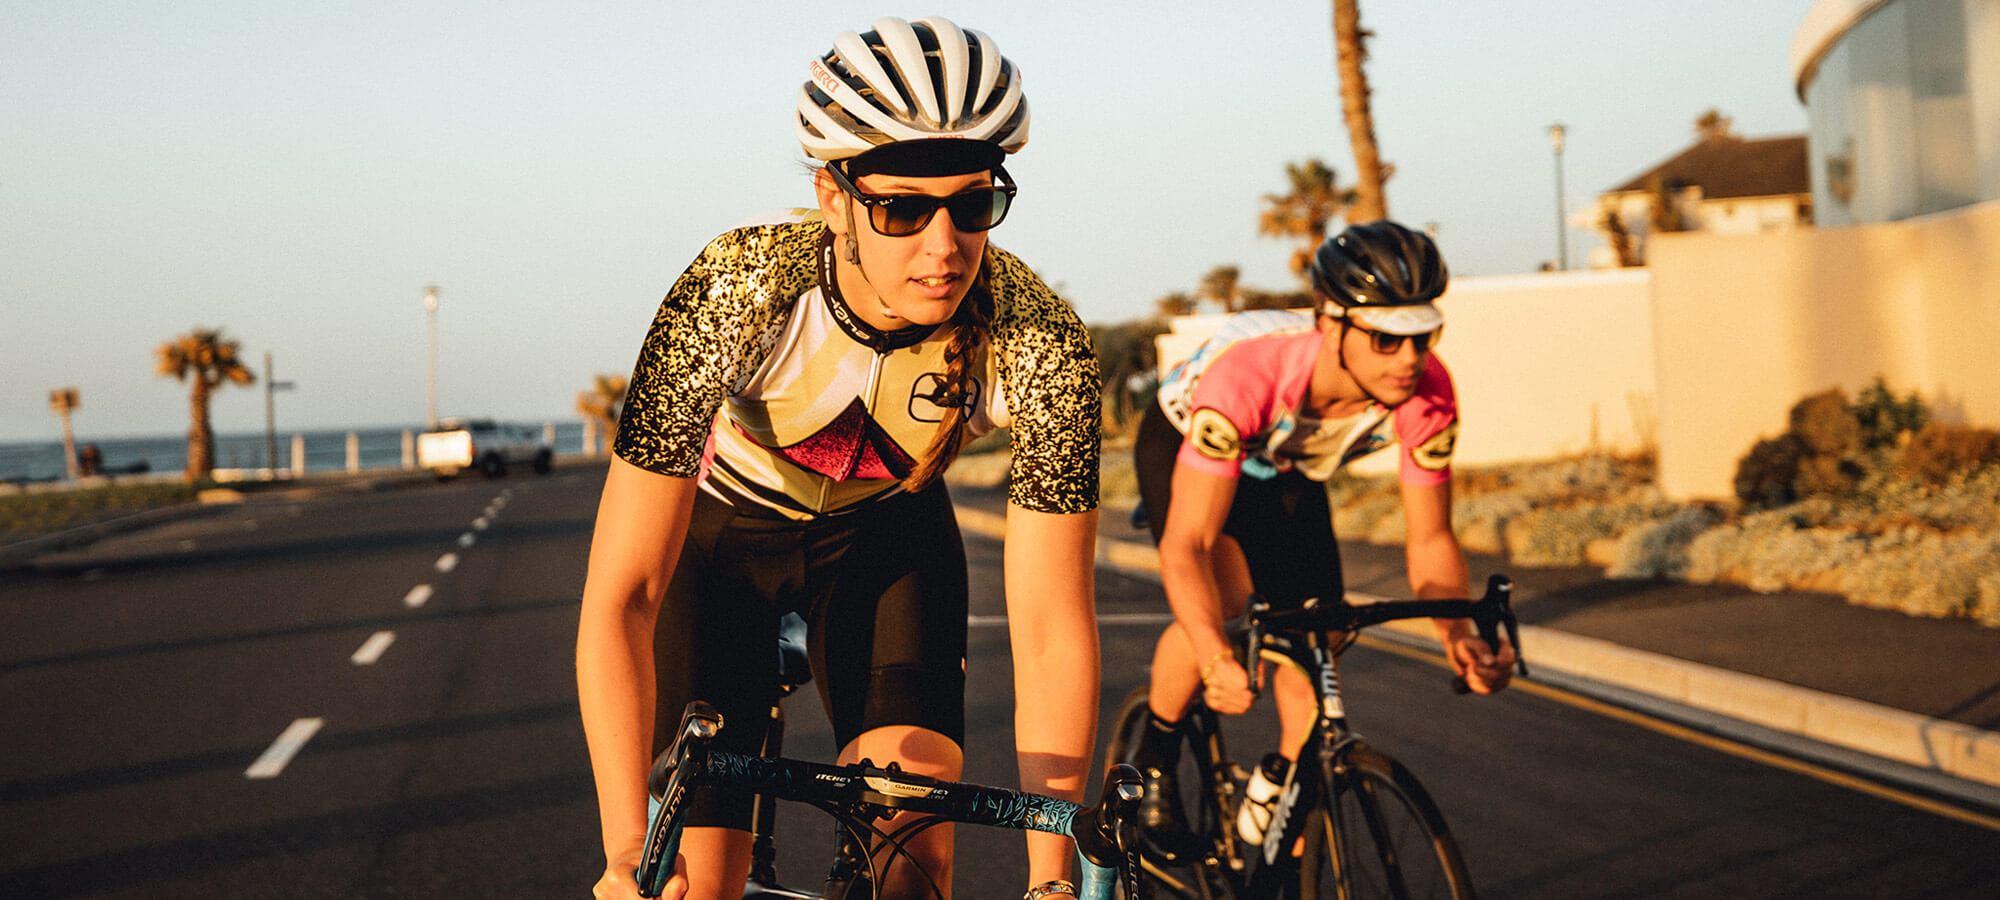 giordana-cycling-homepage-moda-retro-1-web_2100x